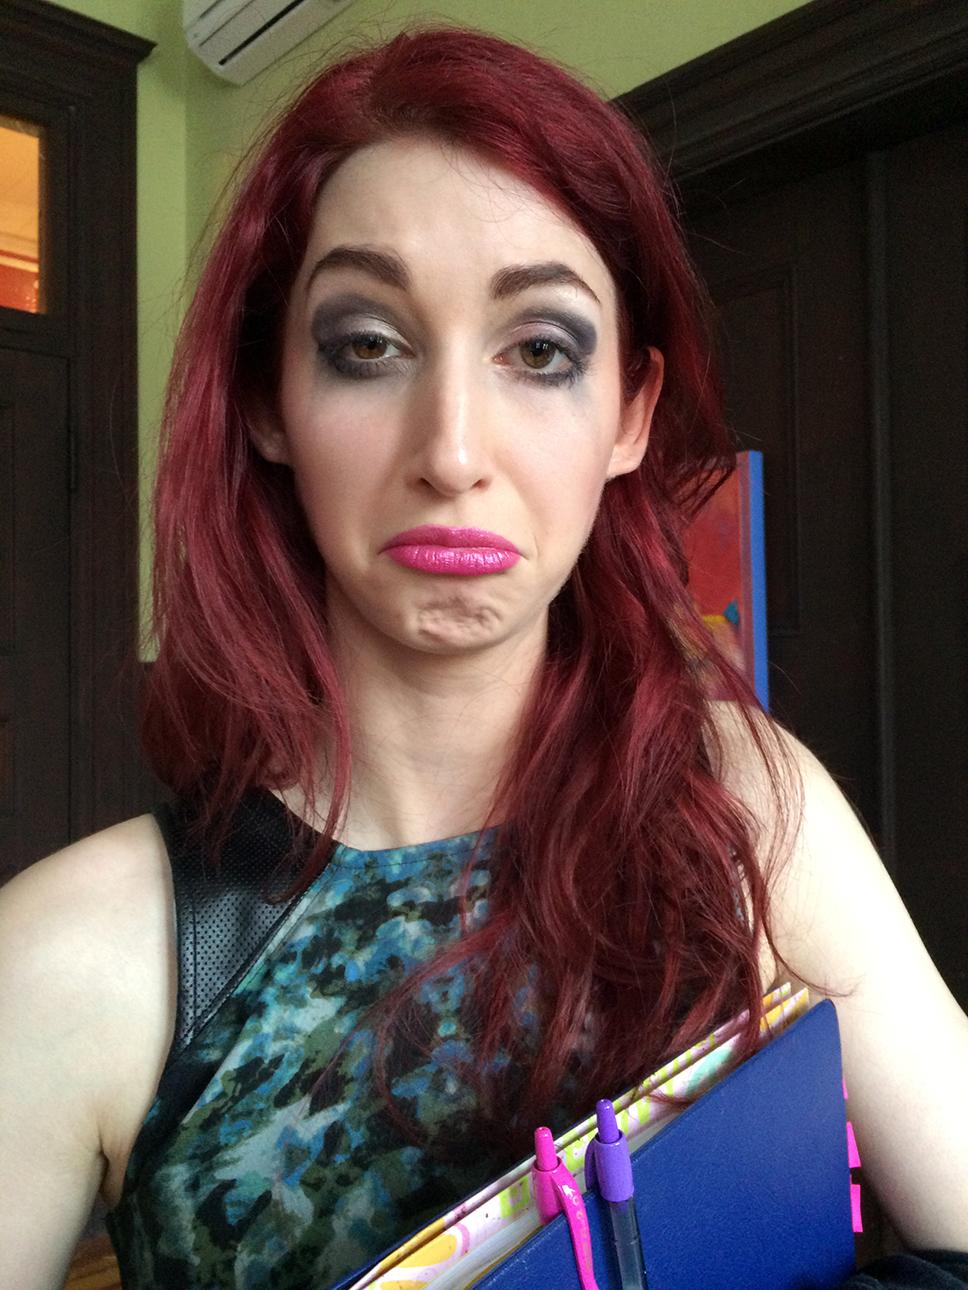 Geena Matuson (@geenamatuson) on set of Disregard The Vampire, 2014.